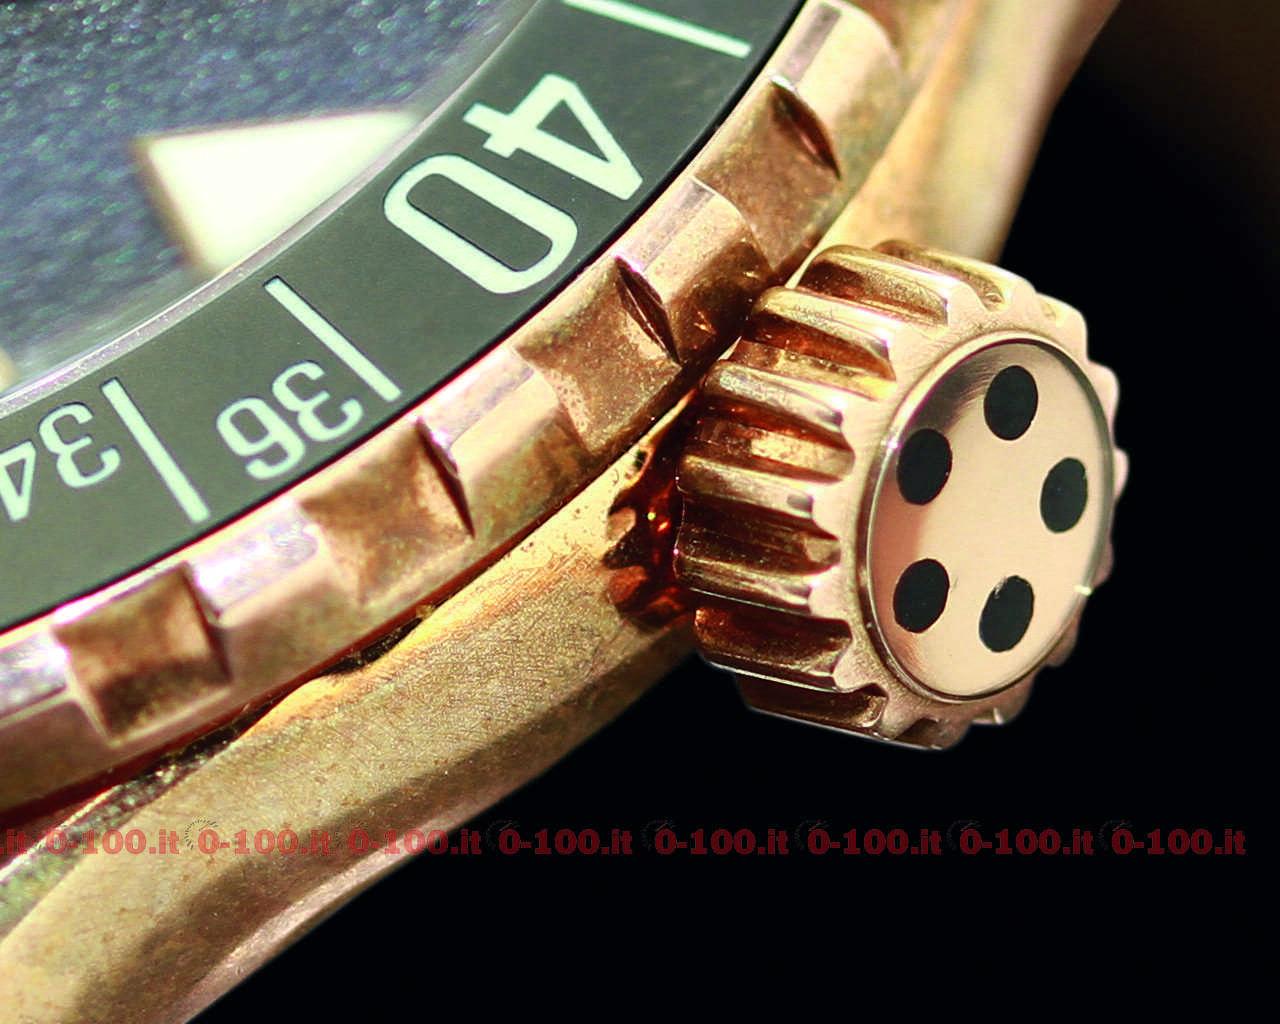 anteprima-baselworld-2017-eterna-kontiki-bronze-manufacture-limited-edition-ref-1291-78-49-1422-prezzo-price_0-1003